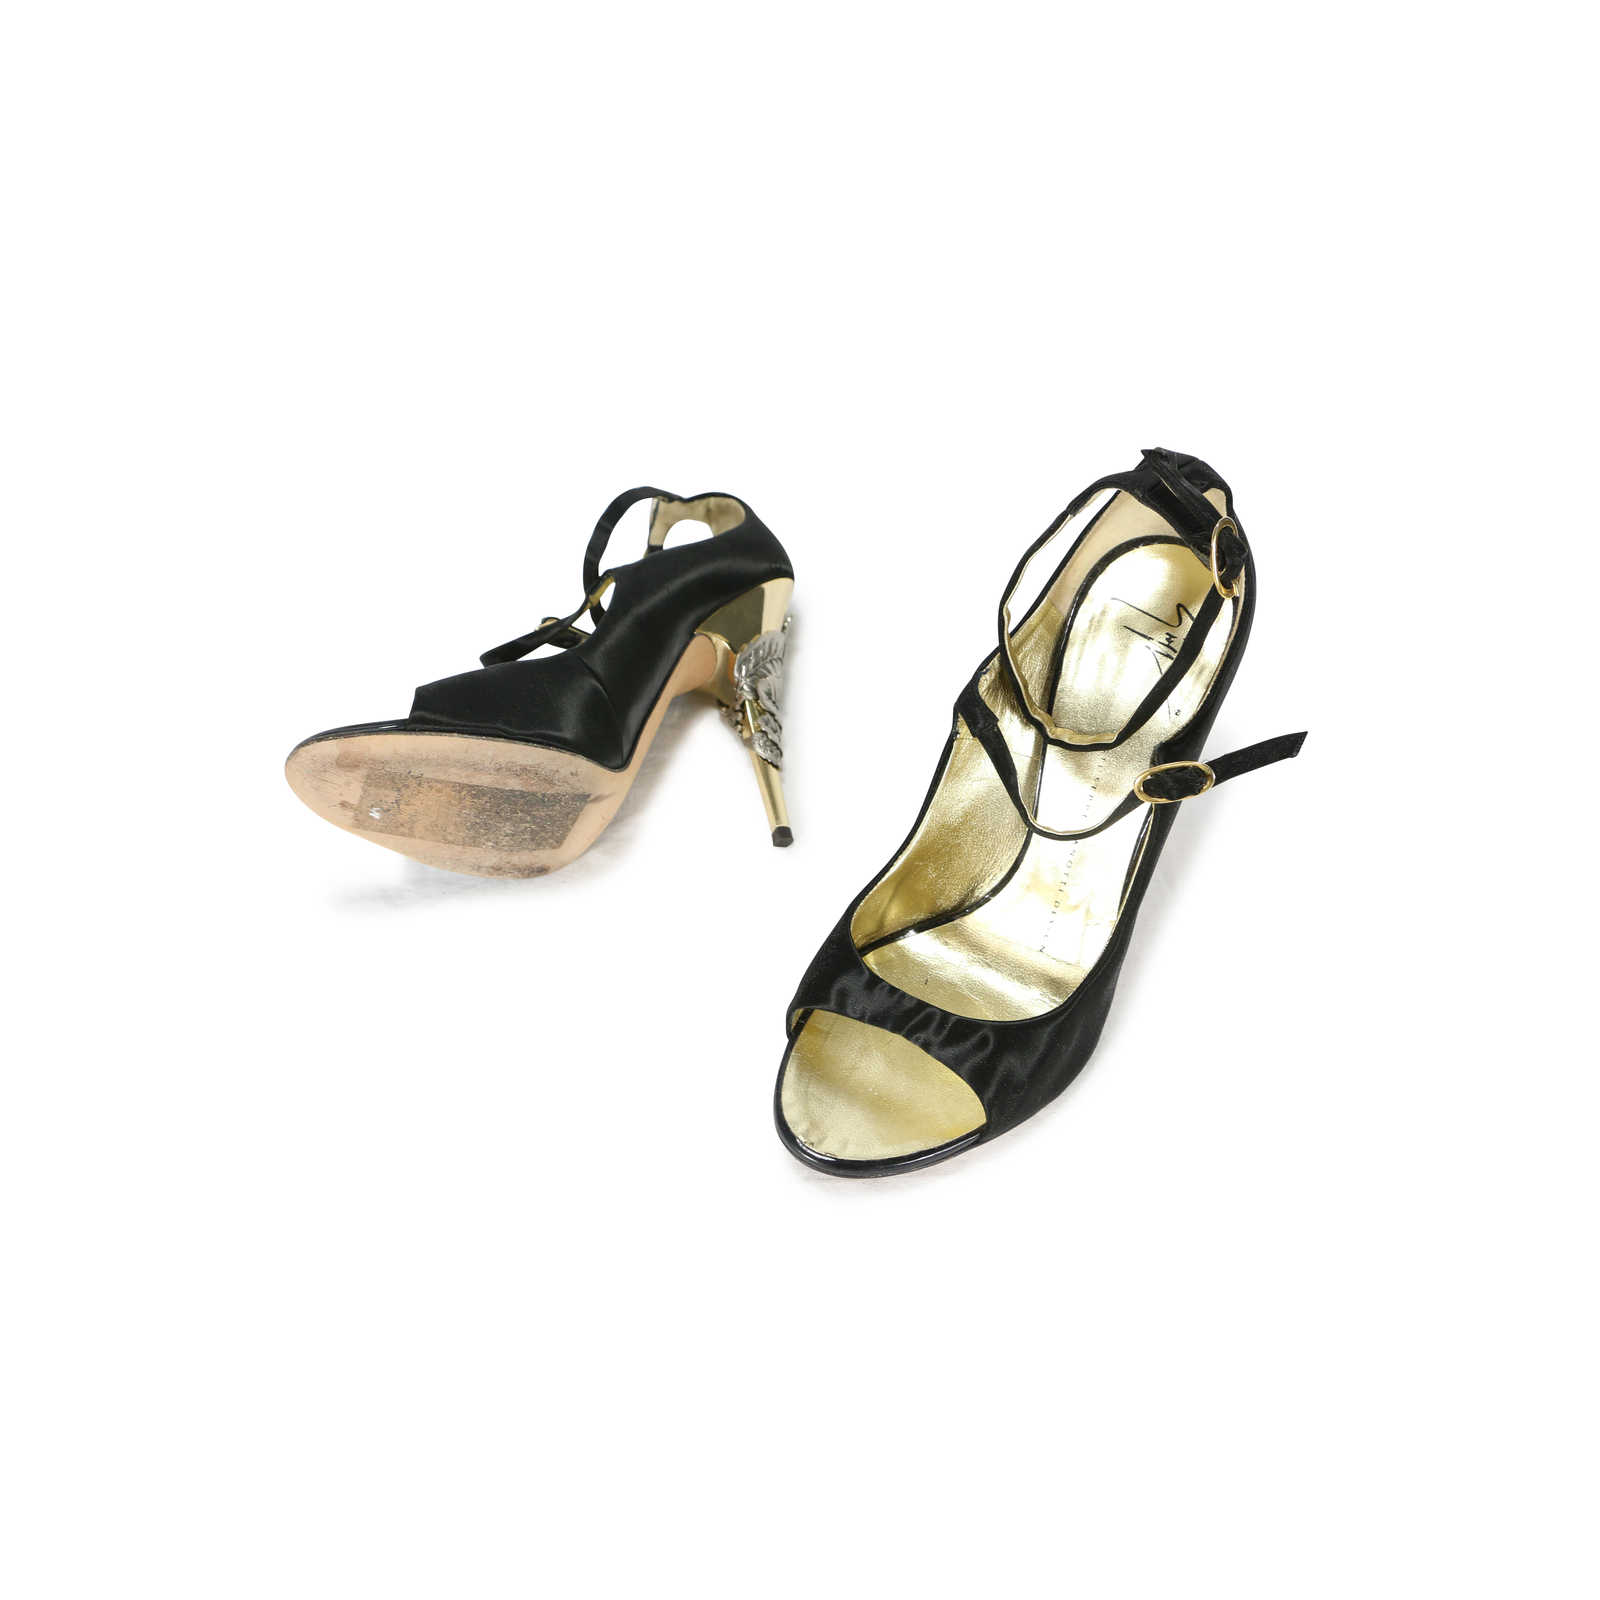 bfaa0ec5825e4 ... Authentic Second Hand Giuseppe Zanotti Wrapped Leaf Gold Heel Peep Toes  (PSS-200- ...